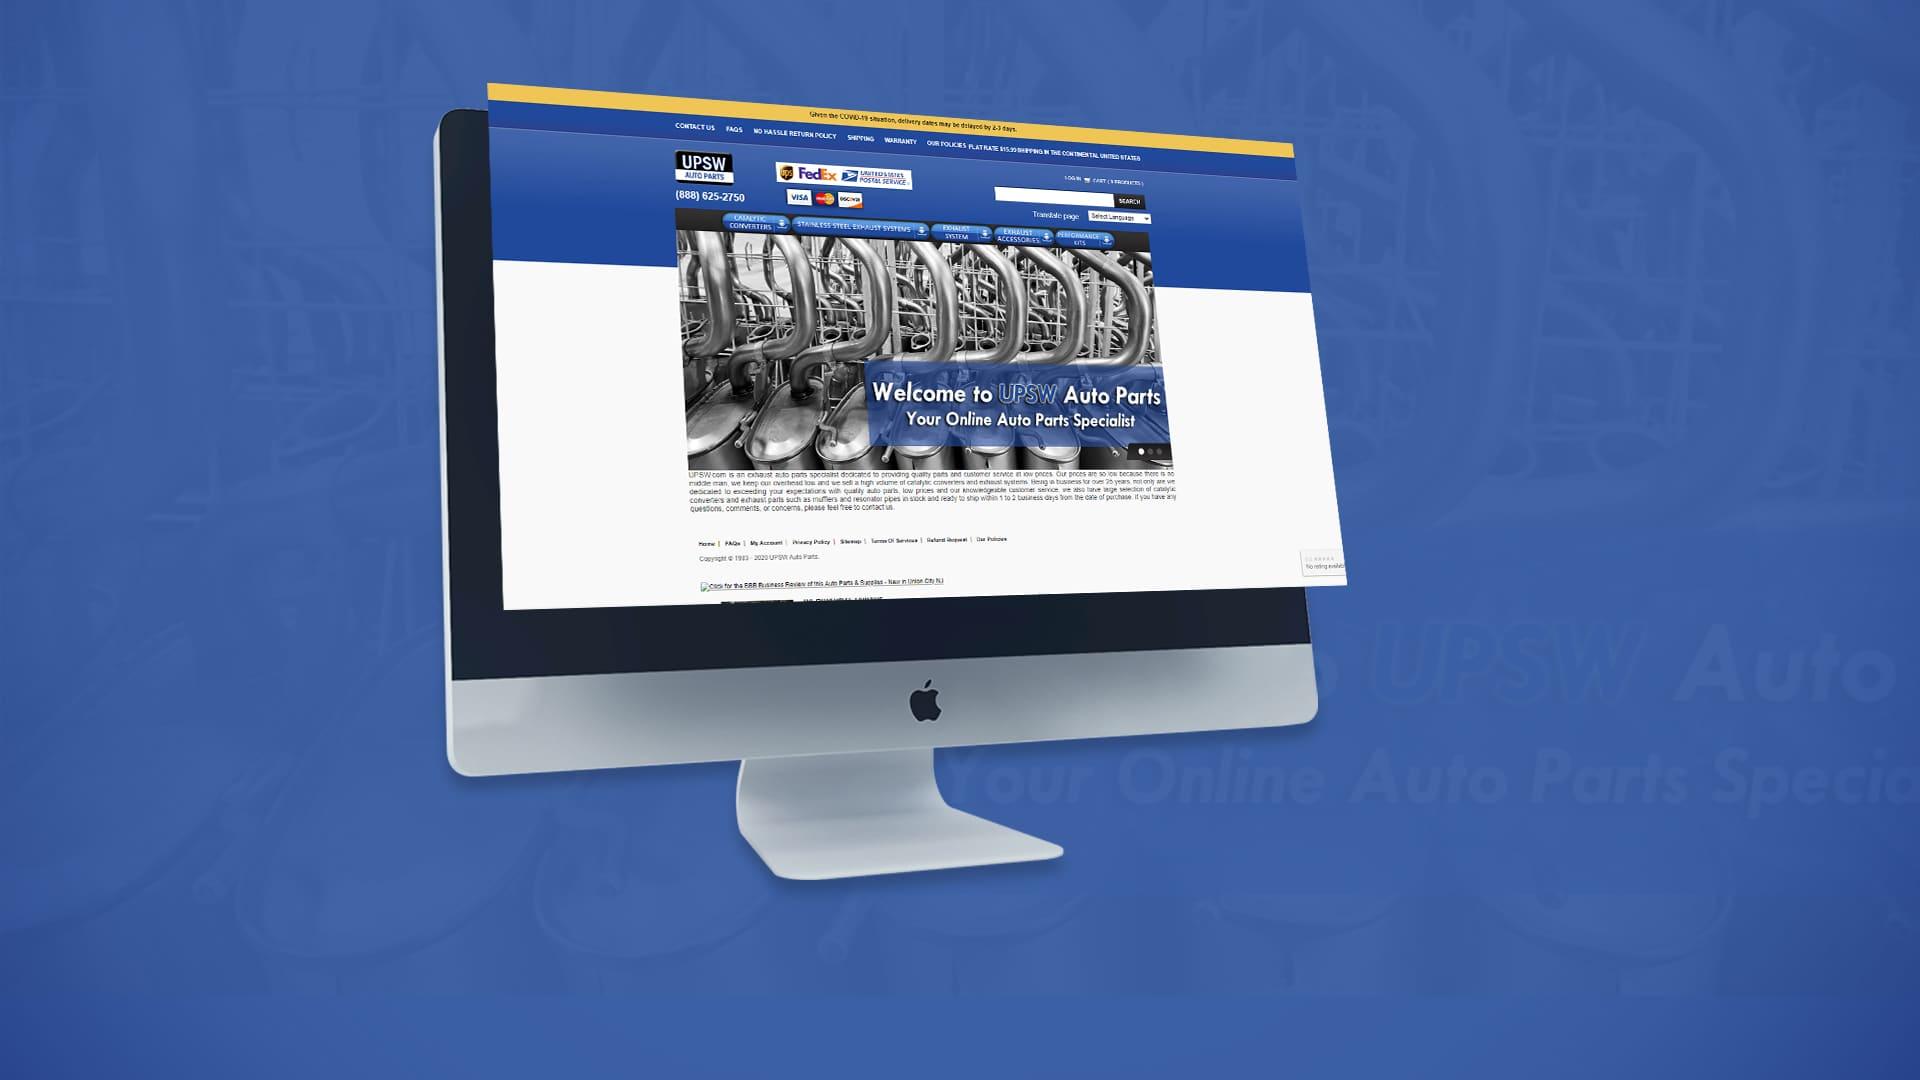 PPC Automotive: UPSW- Online Auto Parts Specialist